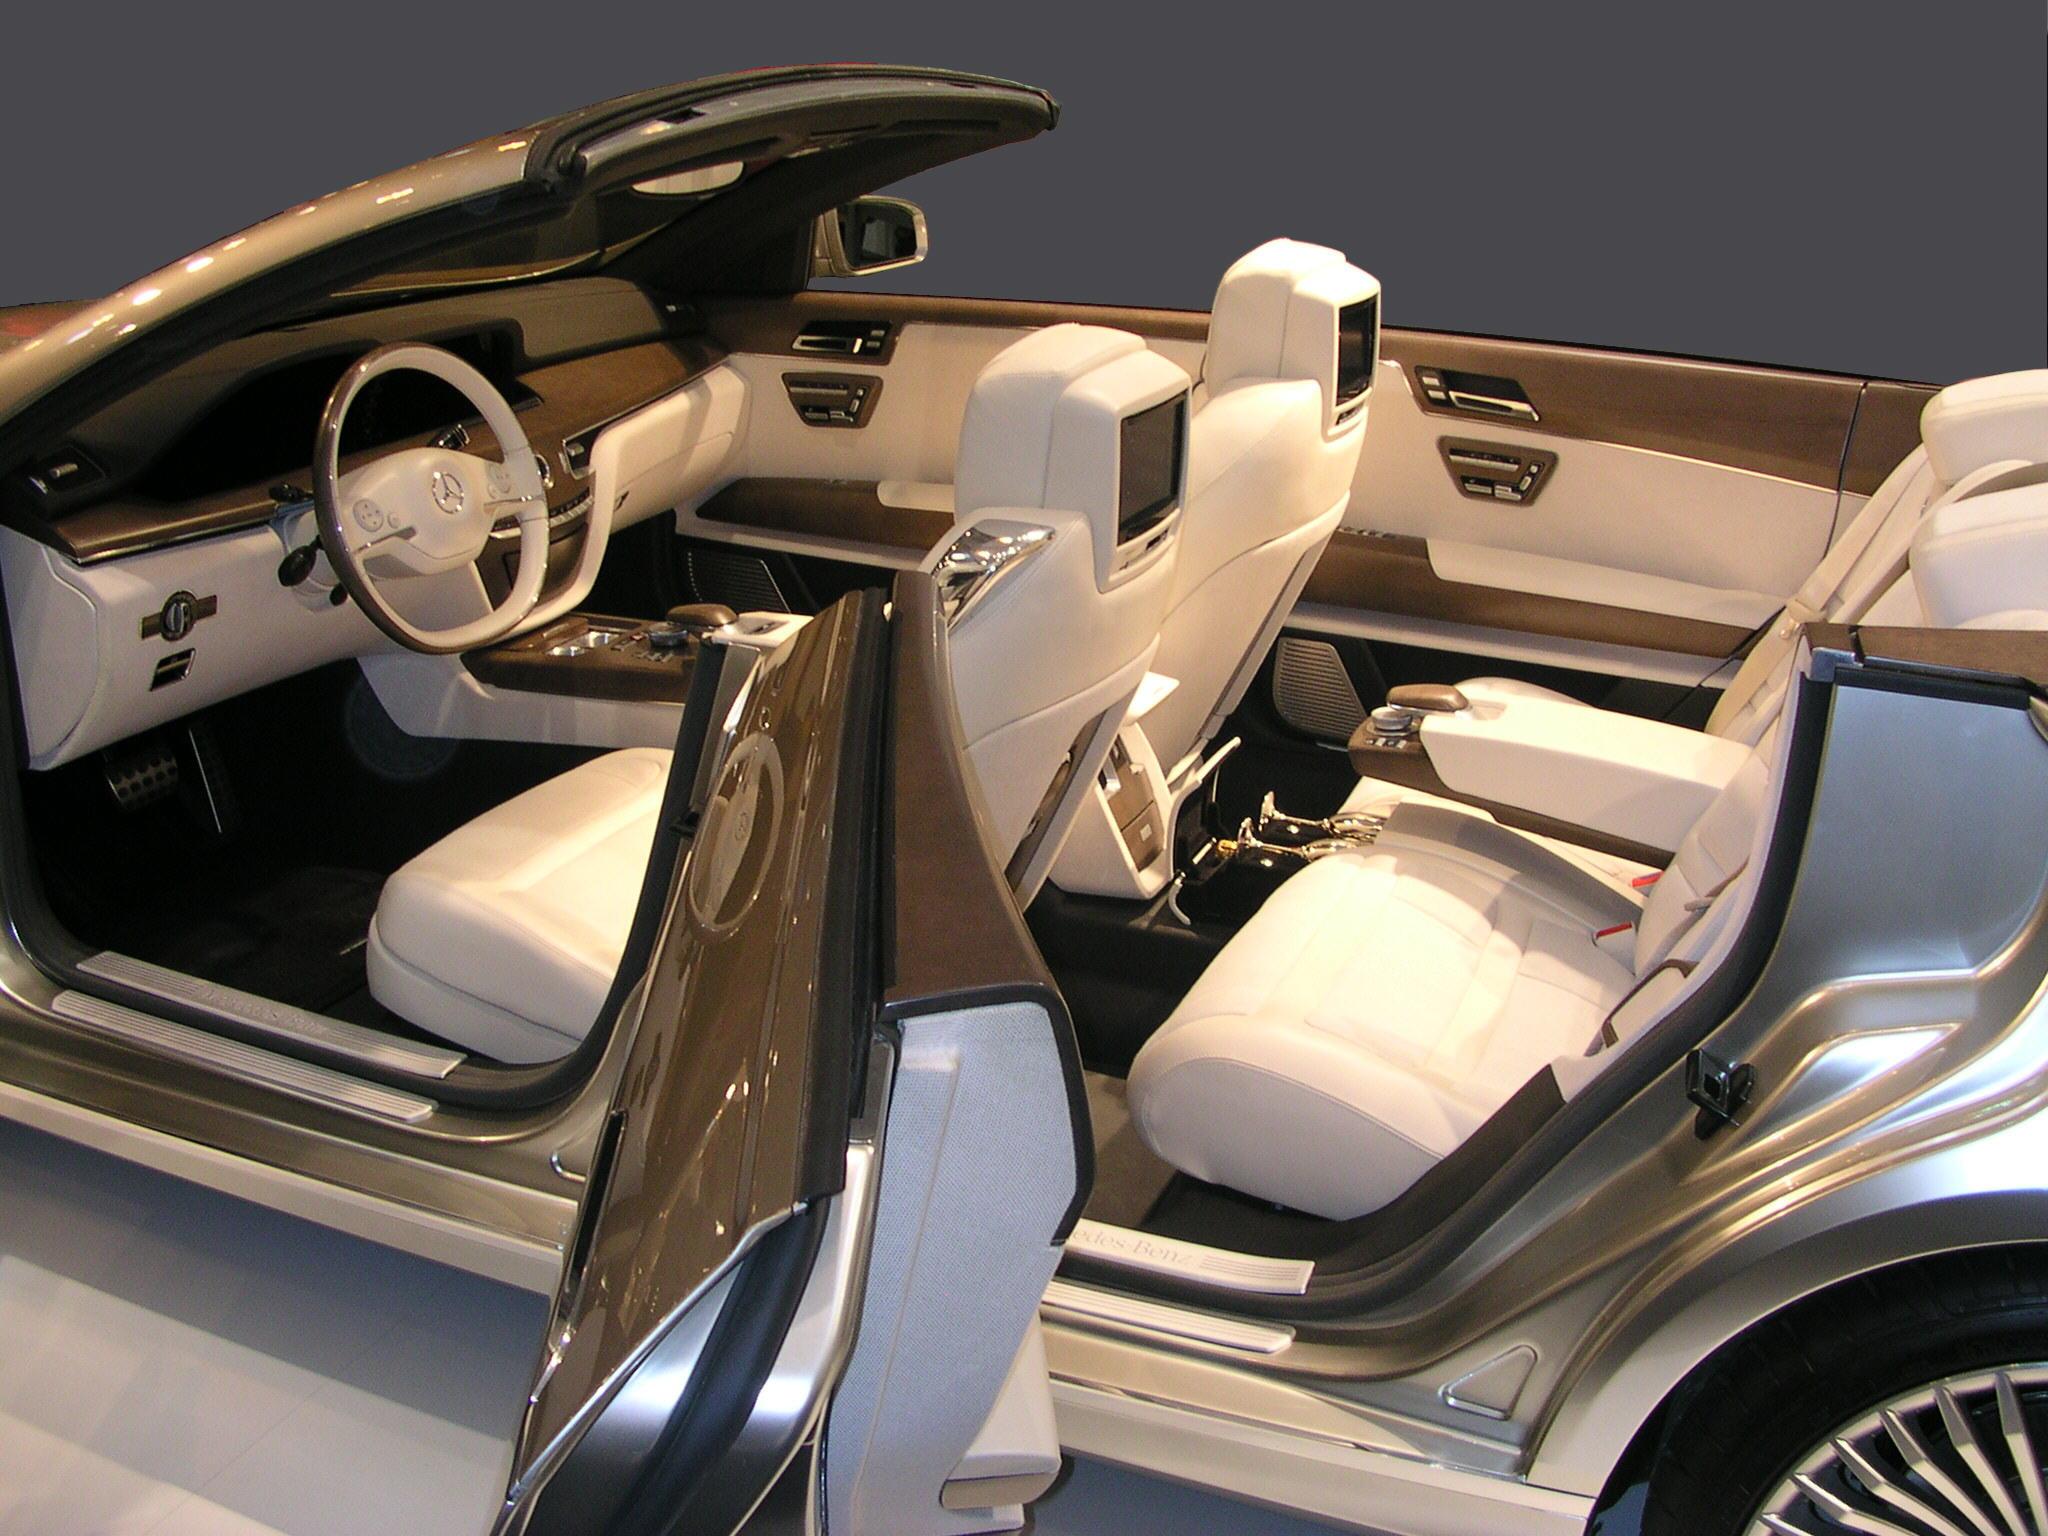 Mercedes benz ocean drive 03 a for Mercedes benz ocean drive